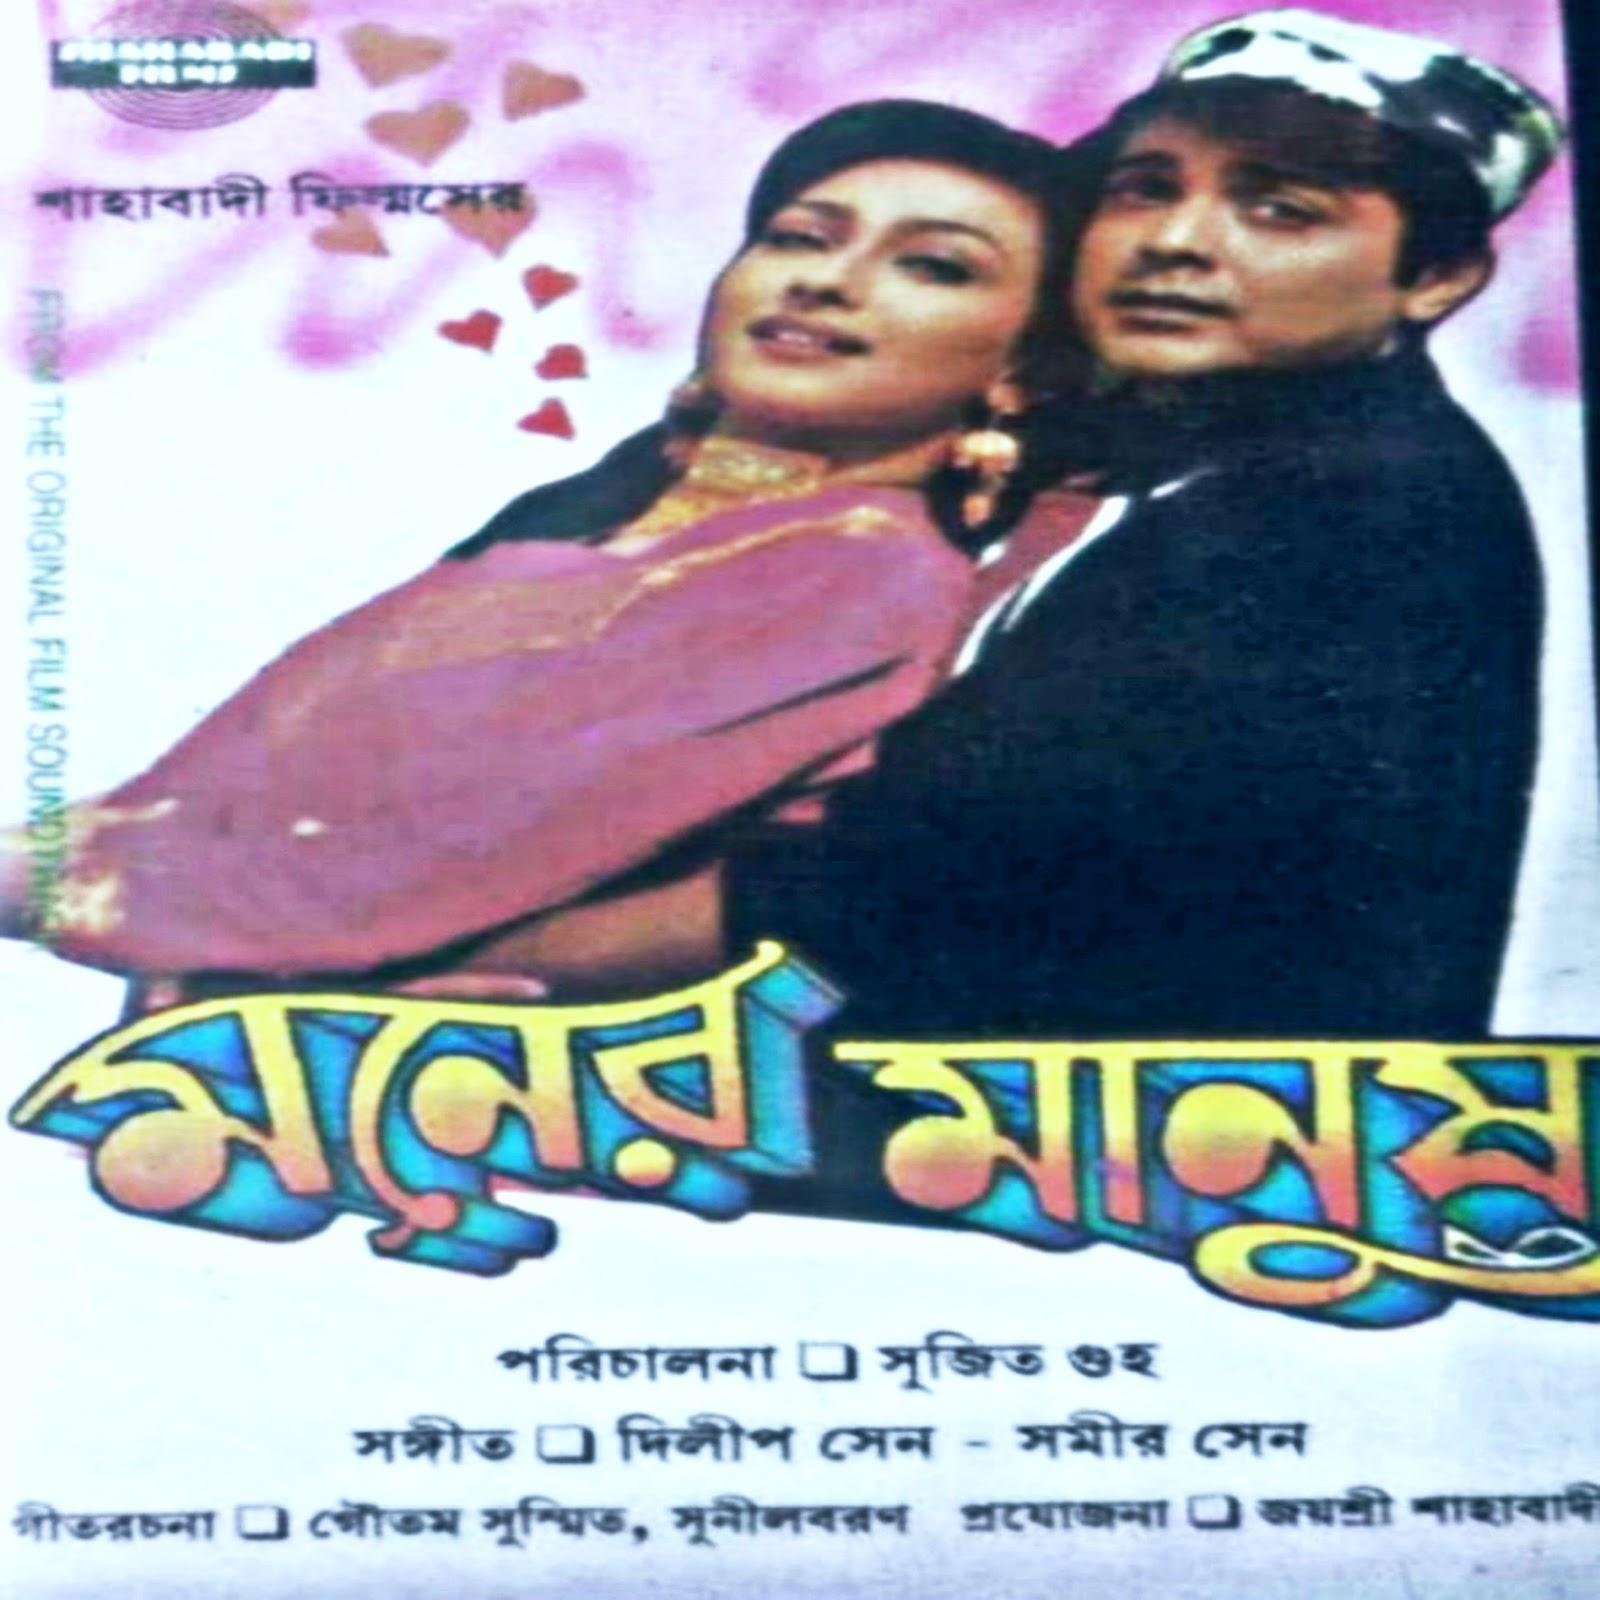 Best of alka yagnik bengali mp3 songs free download.